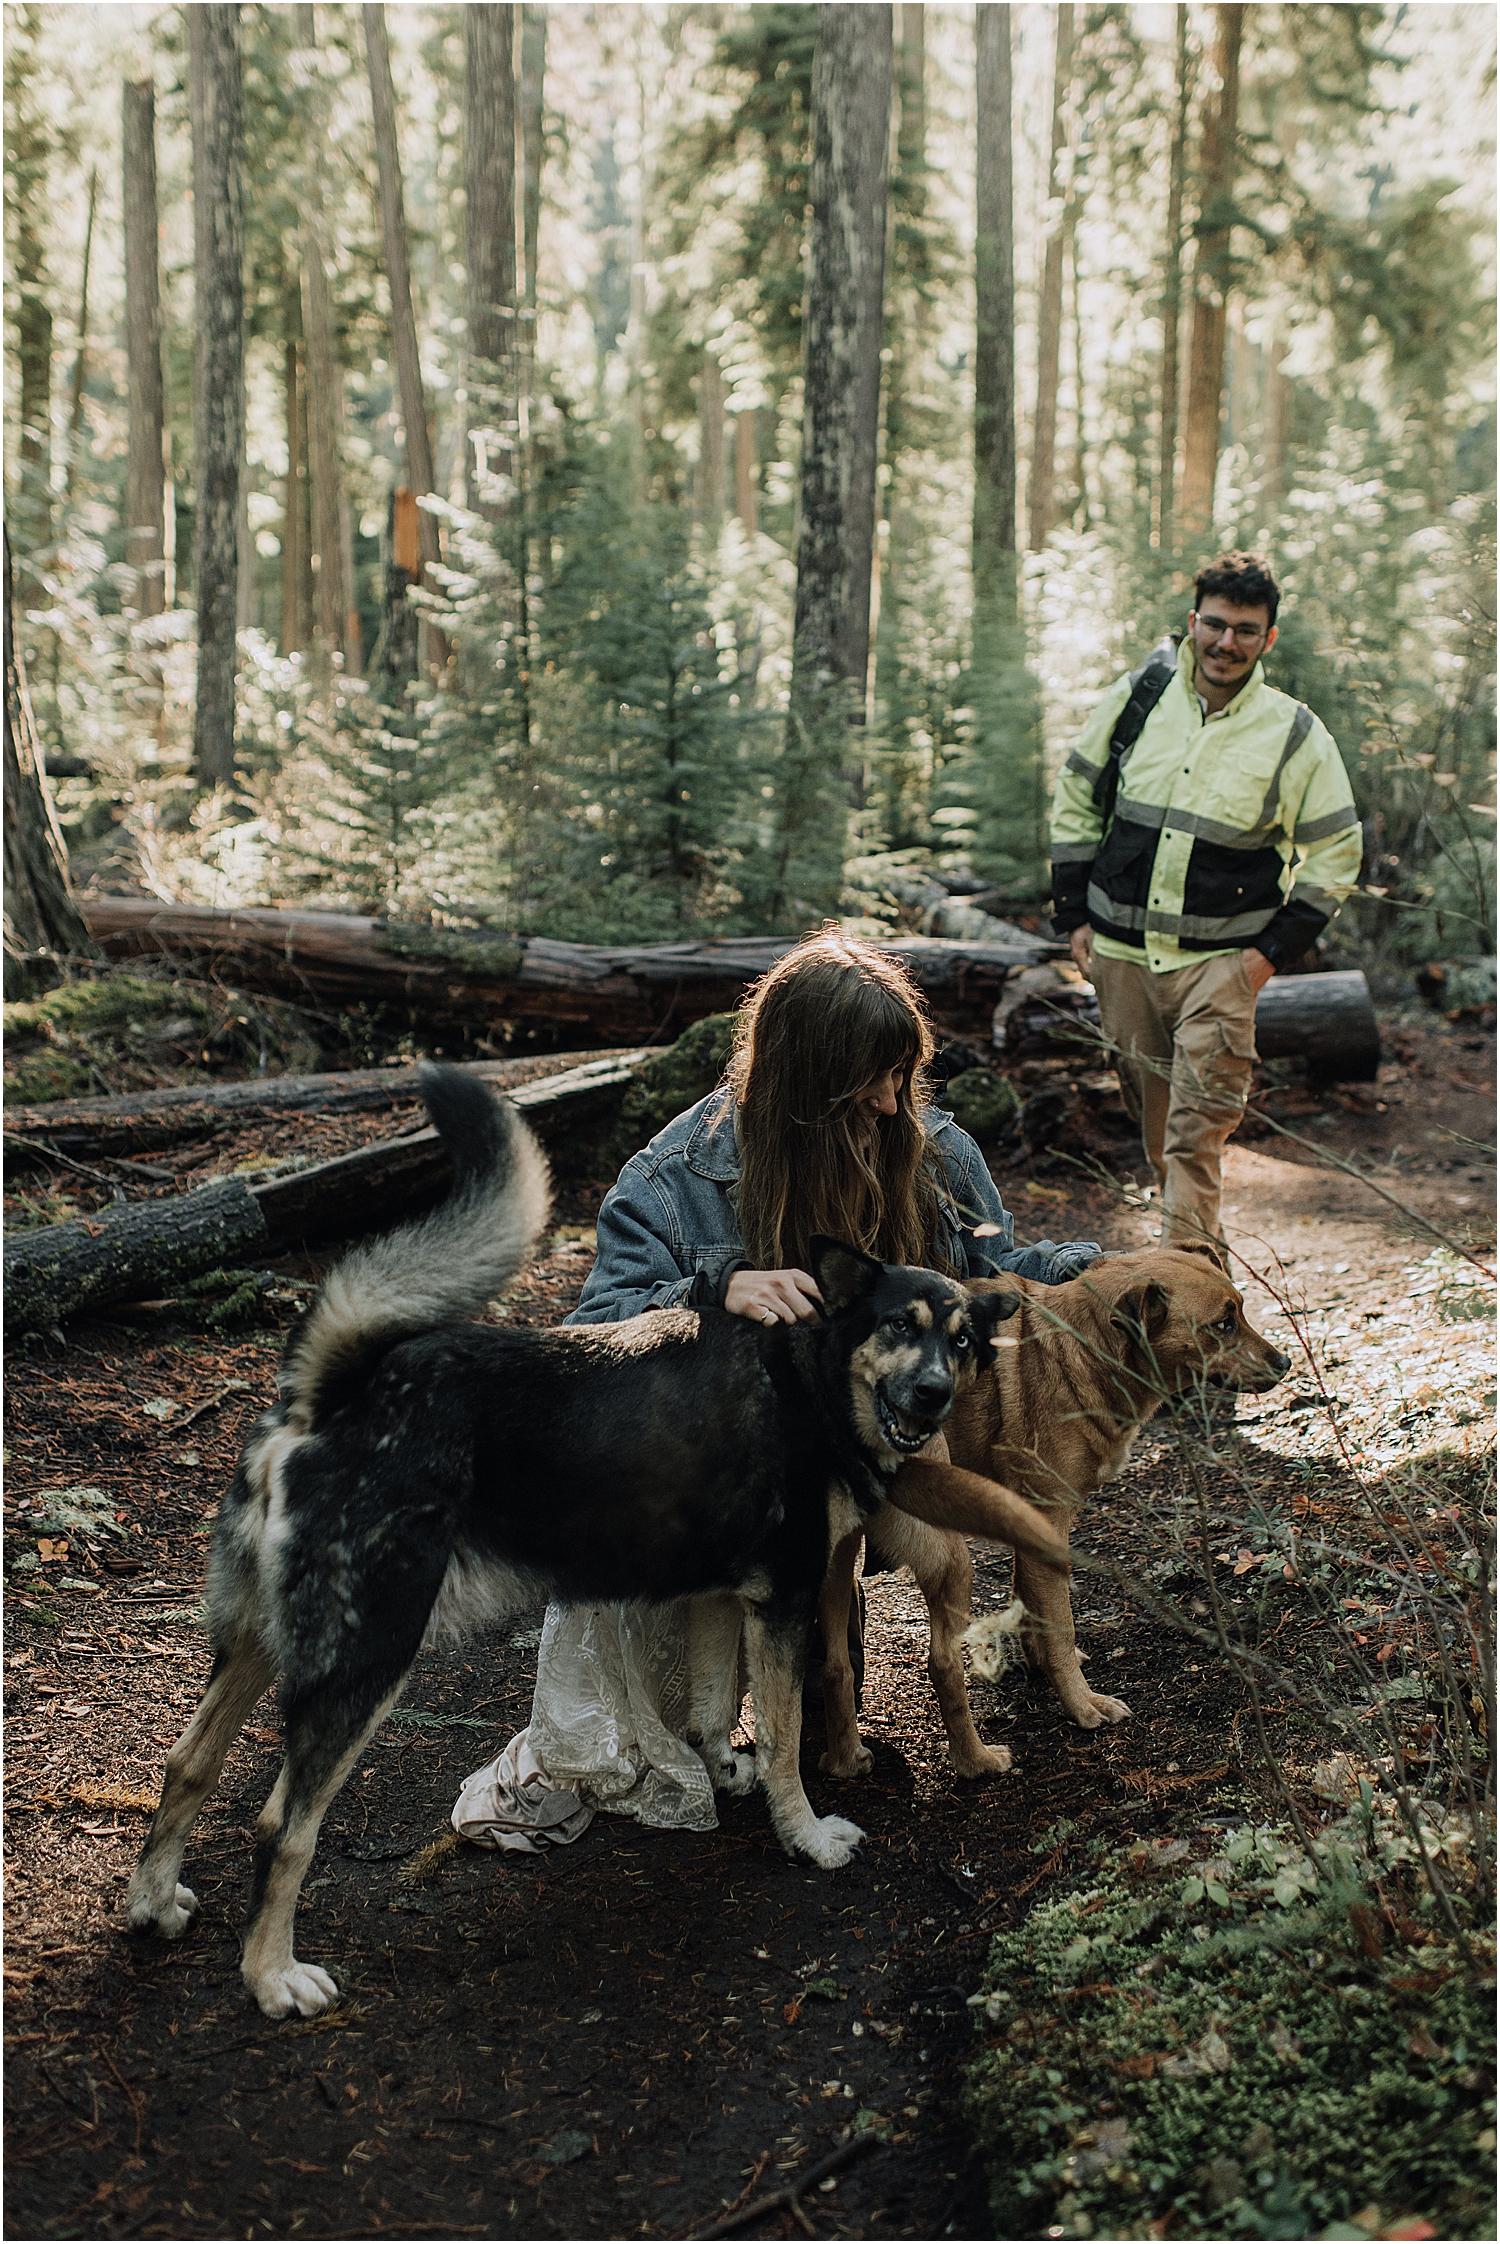 oregon waterfall adventure elopement inspiration at proxy falls with destination wedding photographer naomi levit